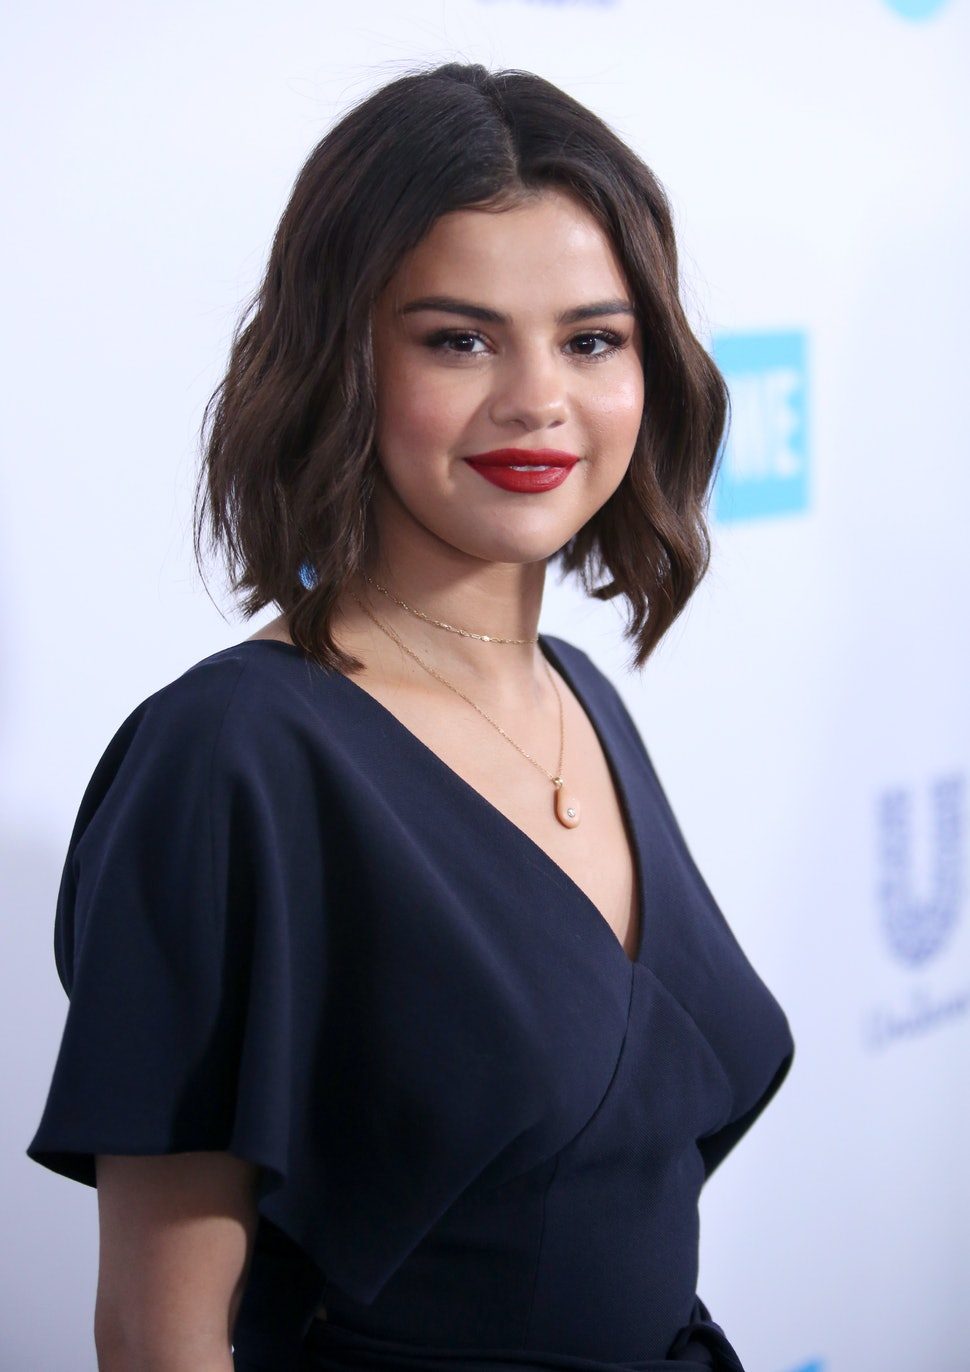 Selena Gomez Shaved Her Head Amp Her Undercut Looks So Cool